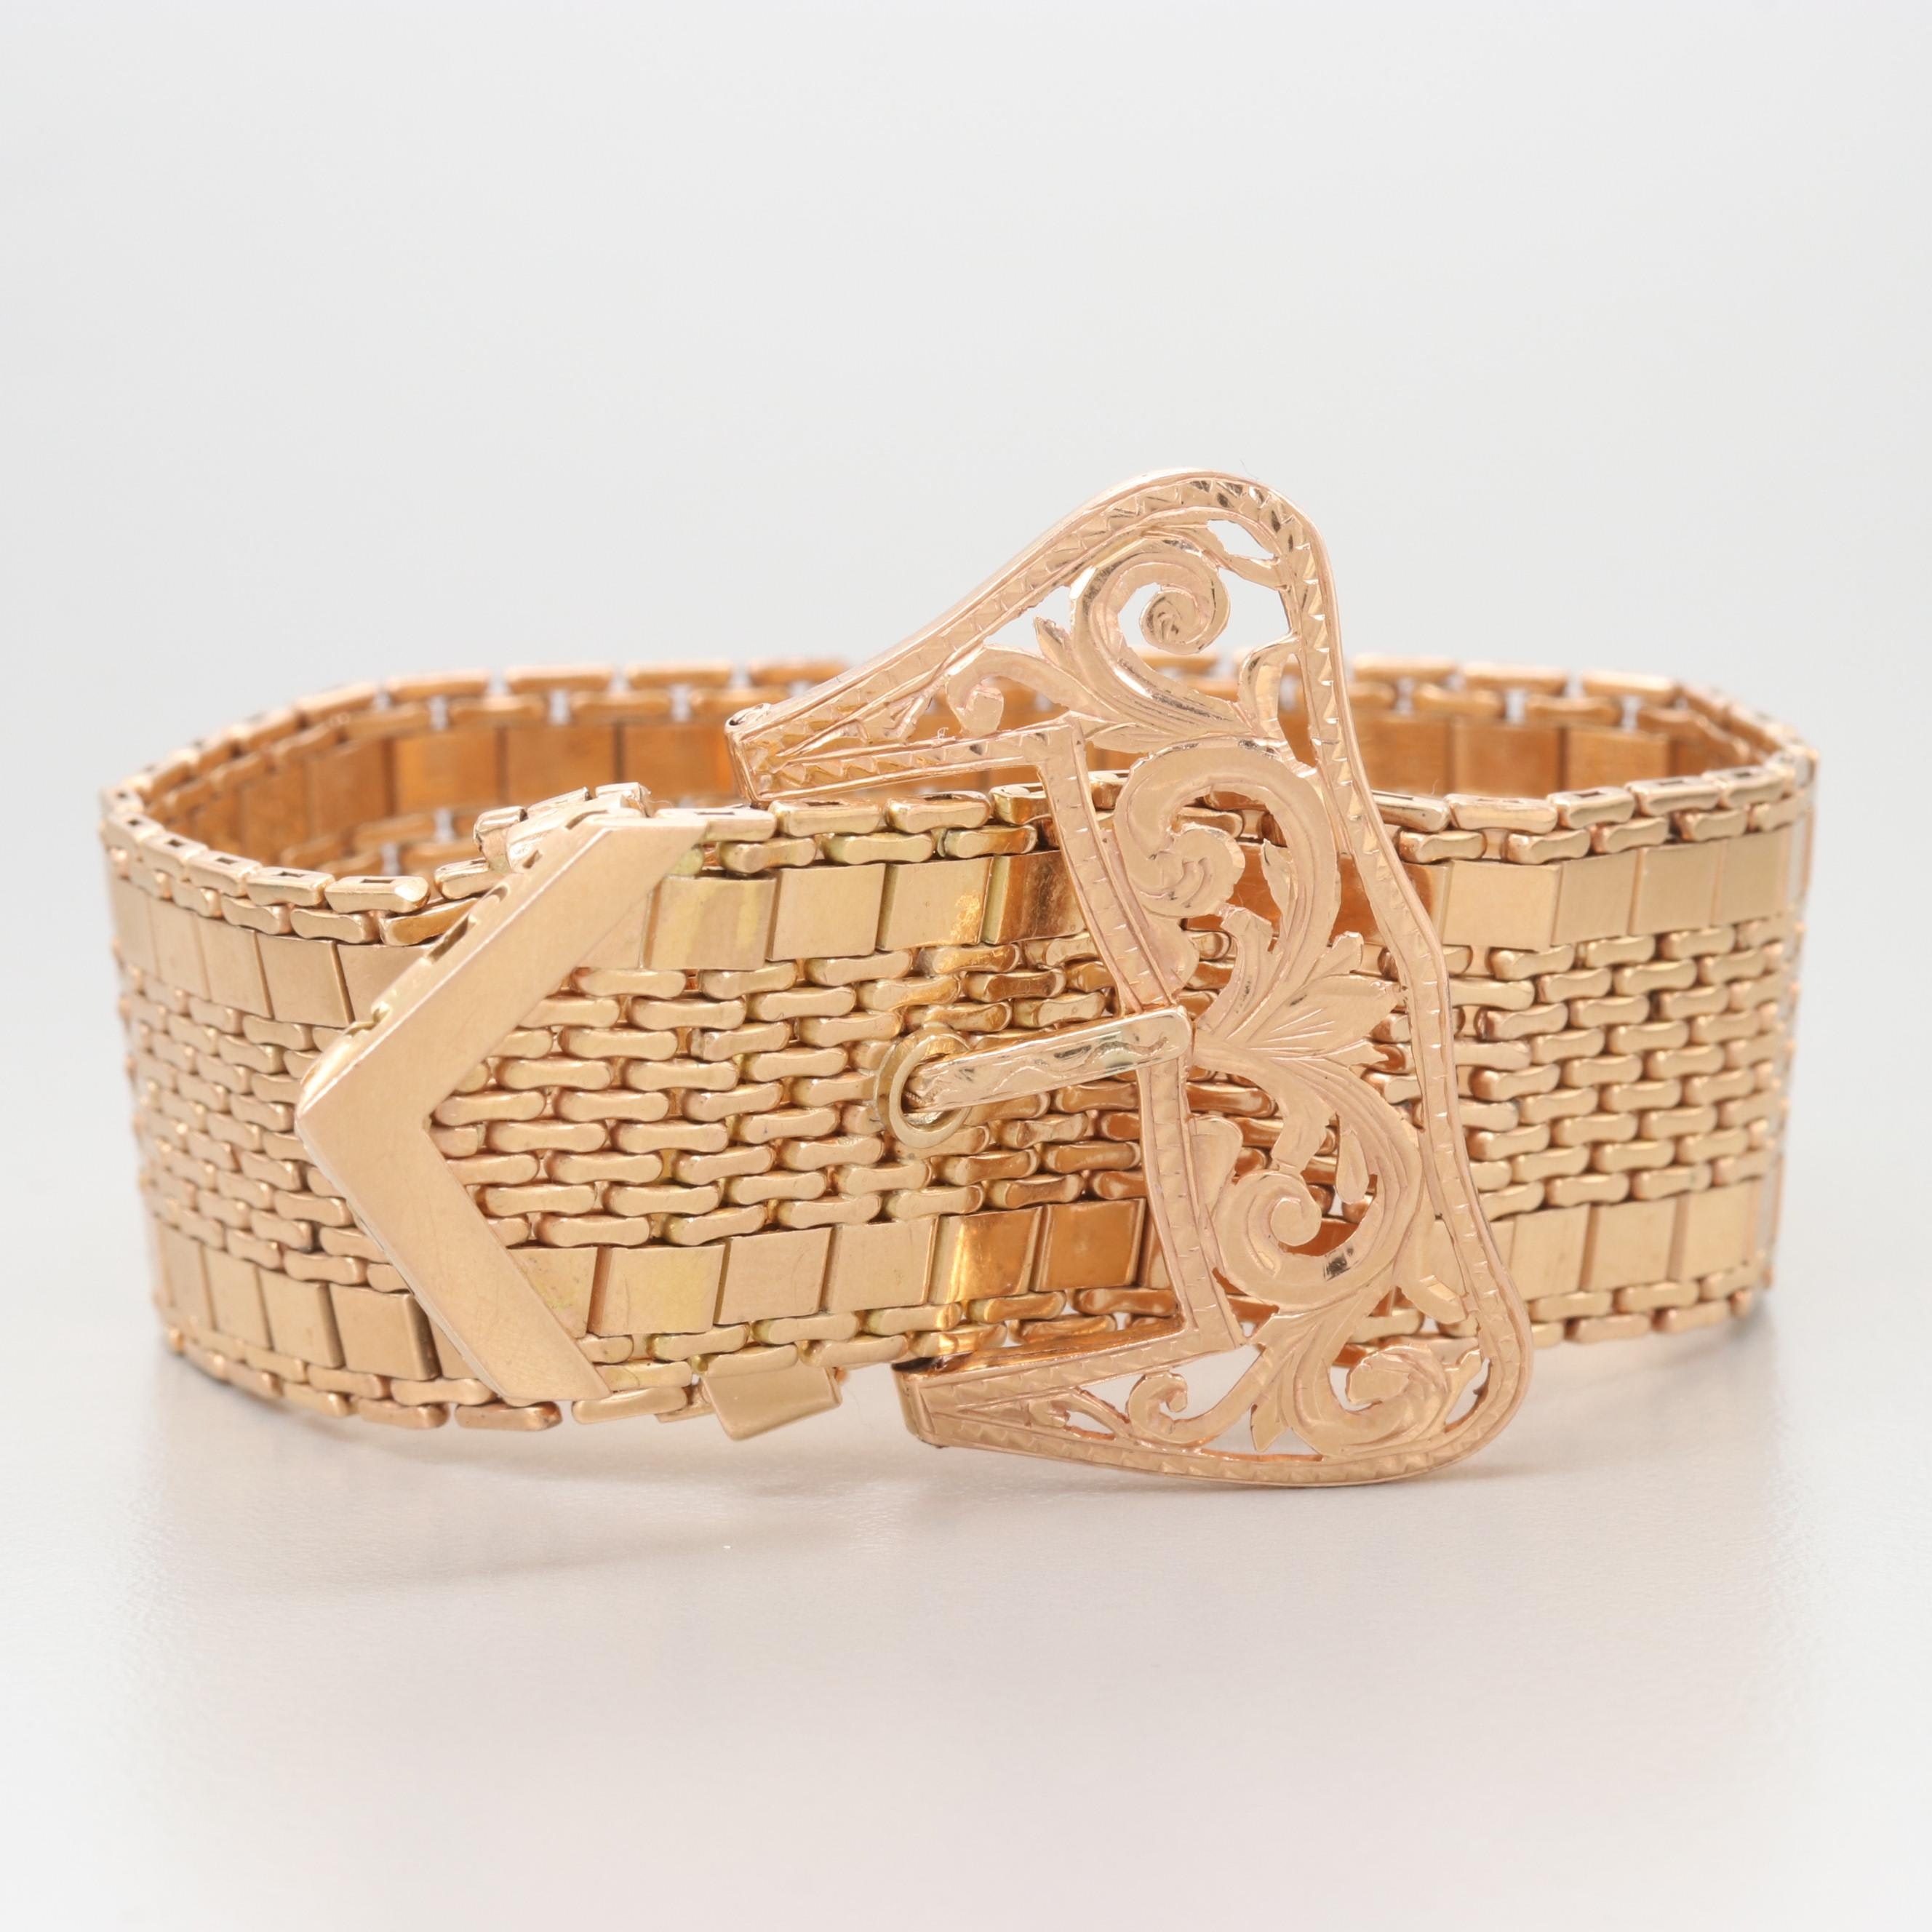 Vintage 14K Yellow Gold Articulated Jarretiére Bracelet with Buckle Fastener